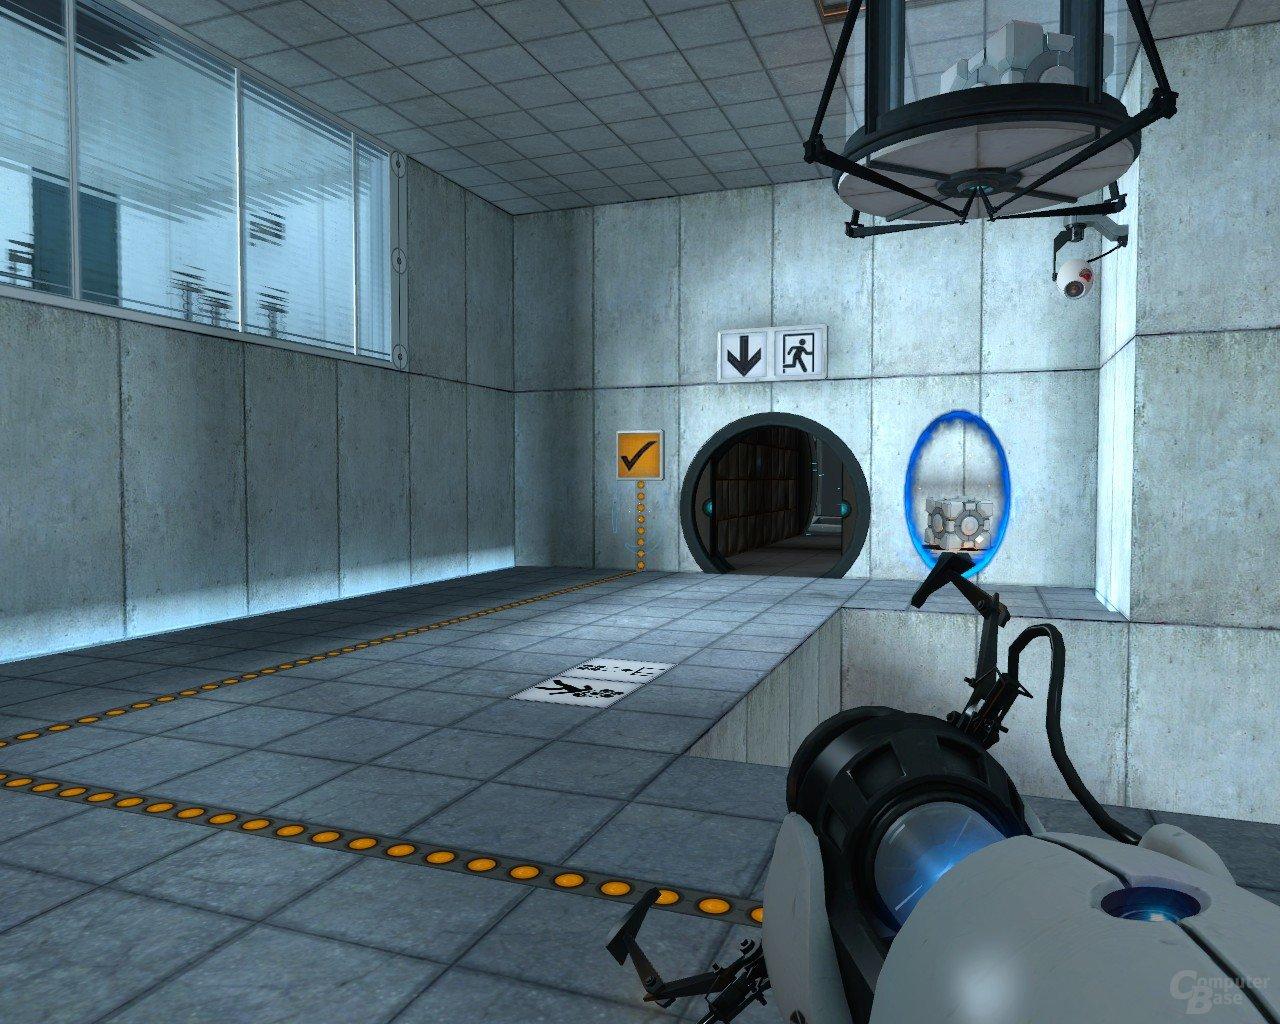 Portal: Neugierig auf mehr